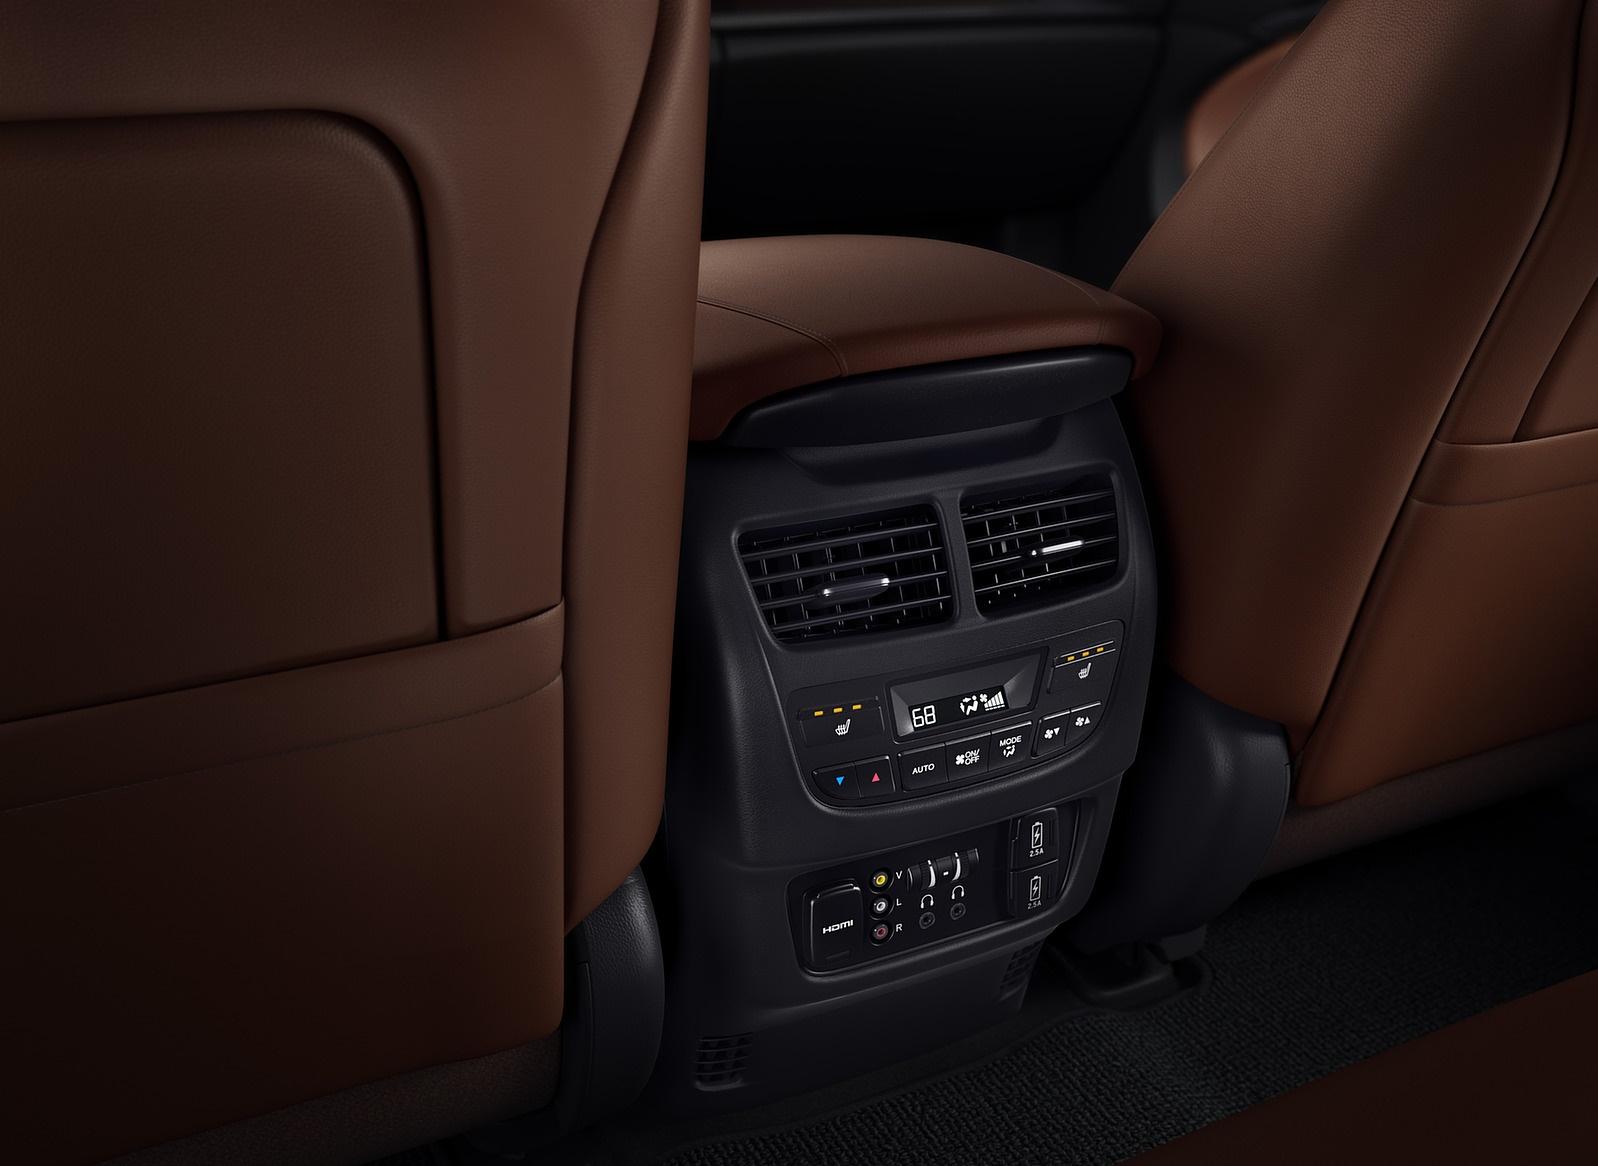 2018 Acura Mdx Interior Detail Wallpaper